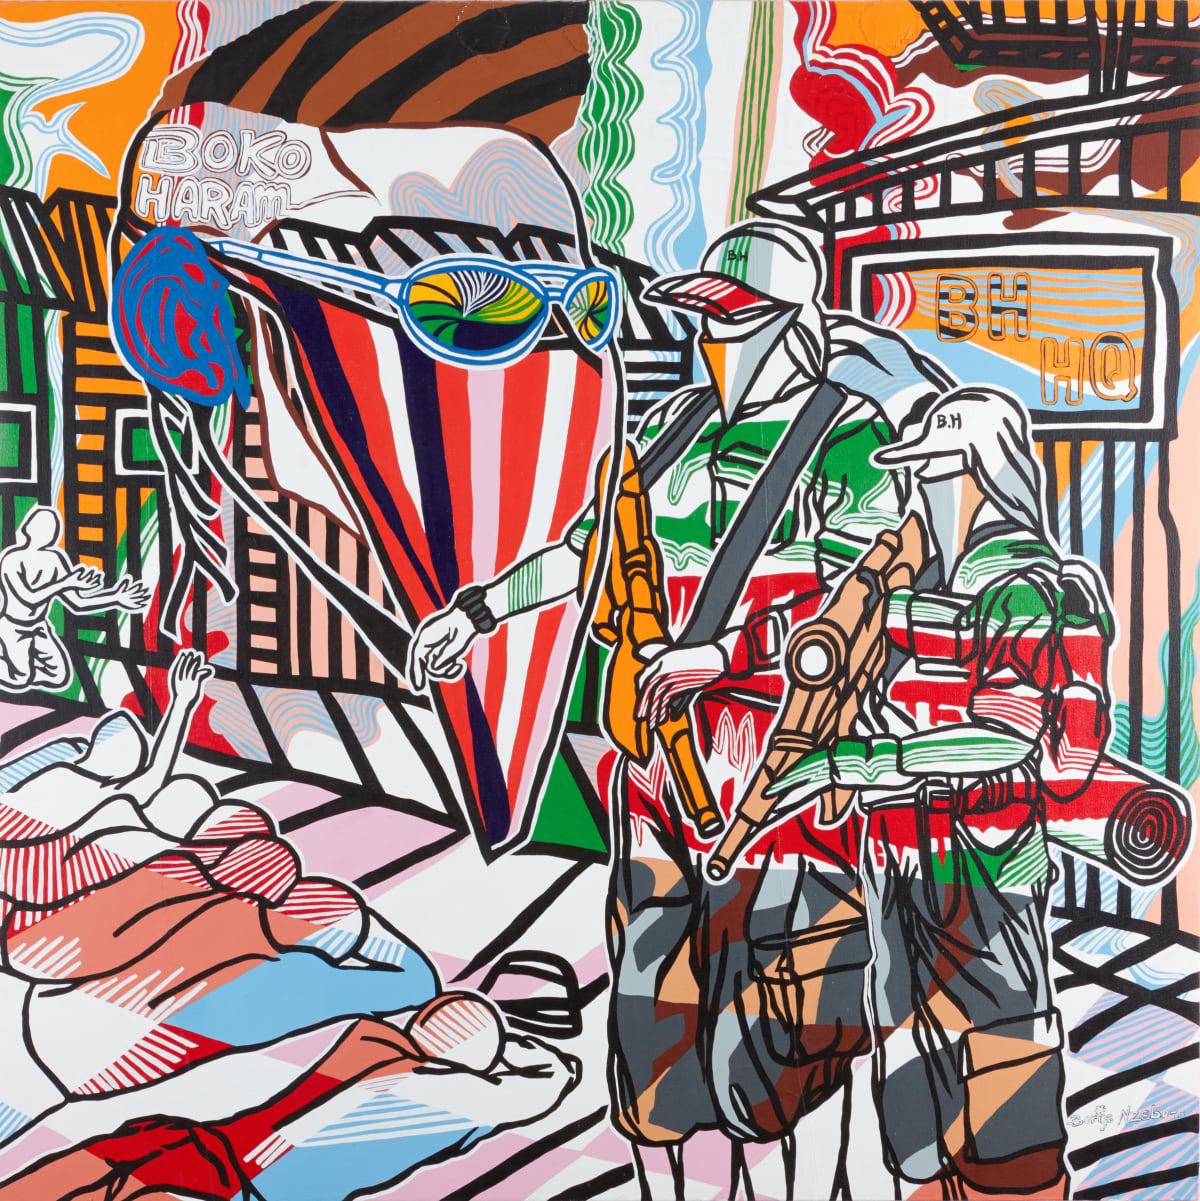 Boris Nzebo, Blood on the Painting, 2016